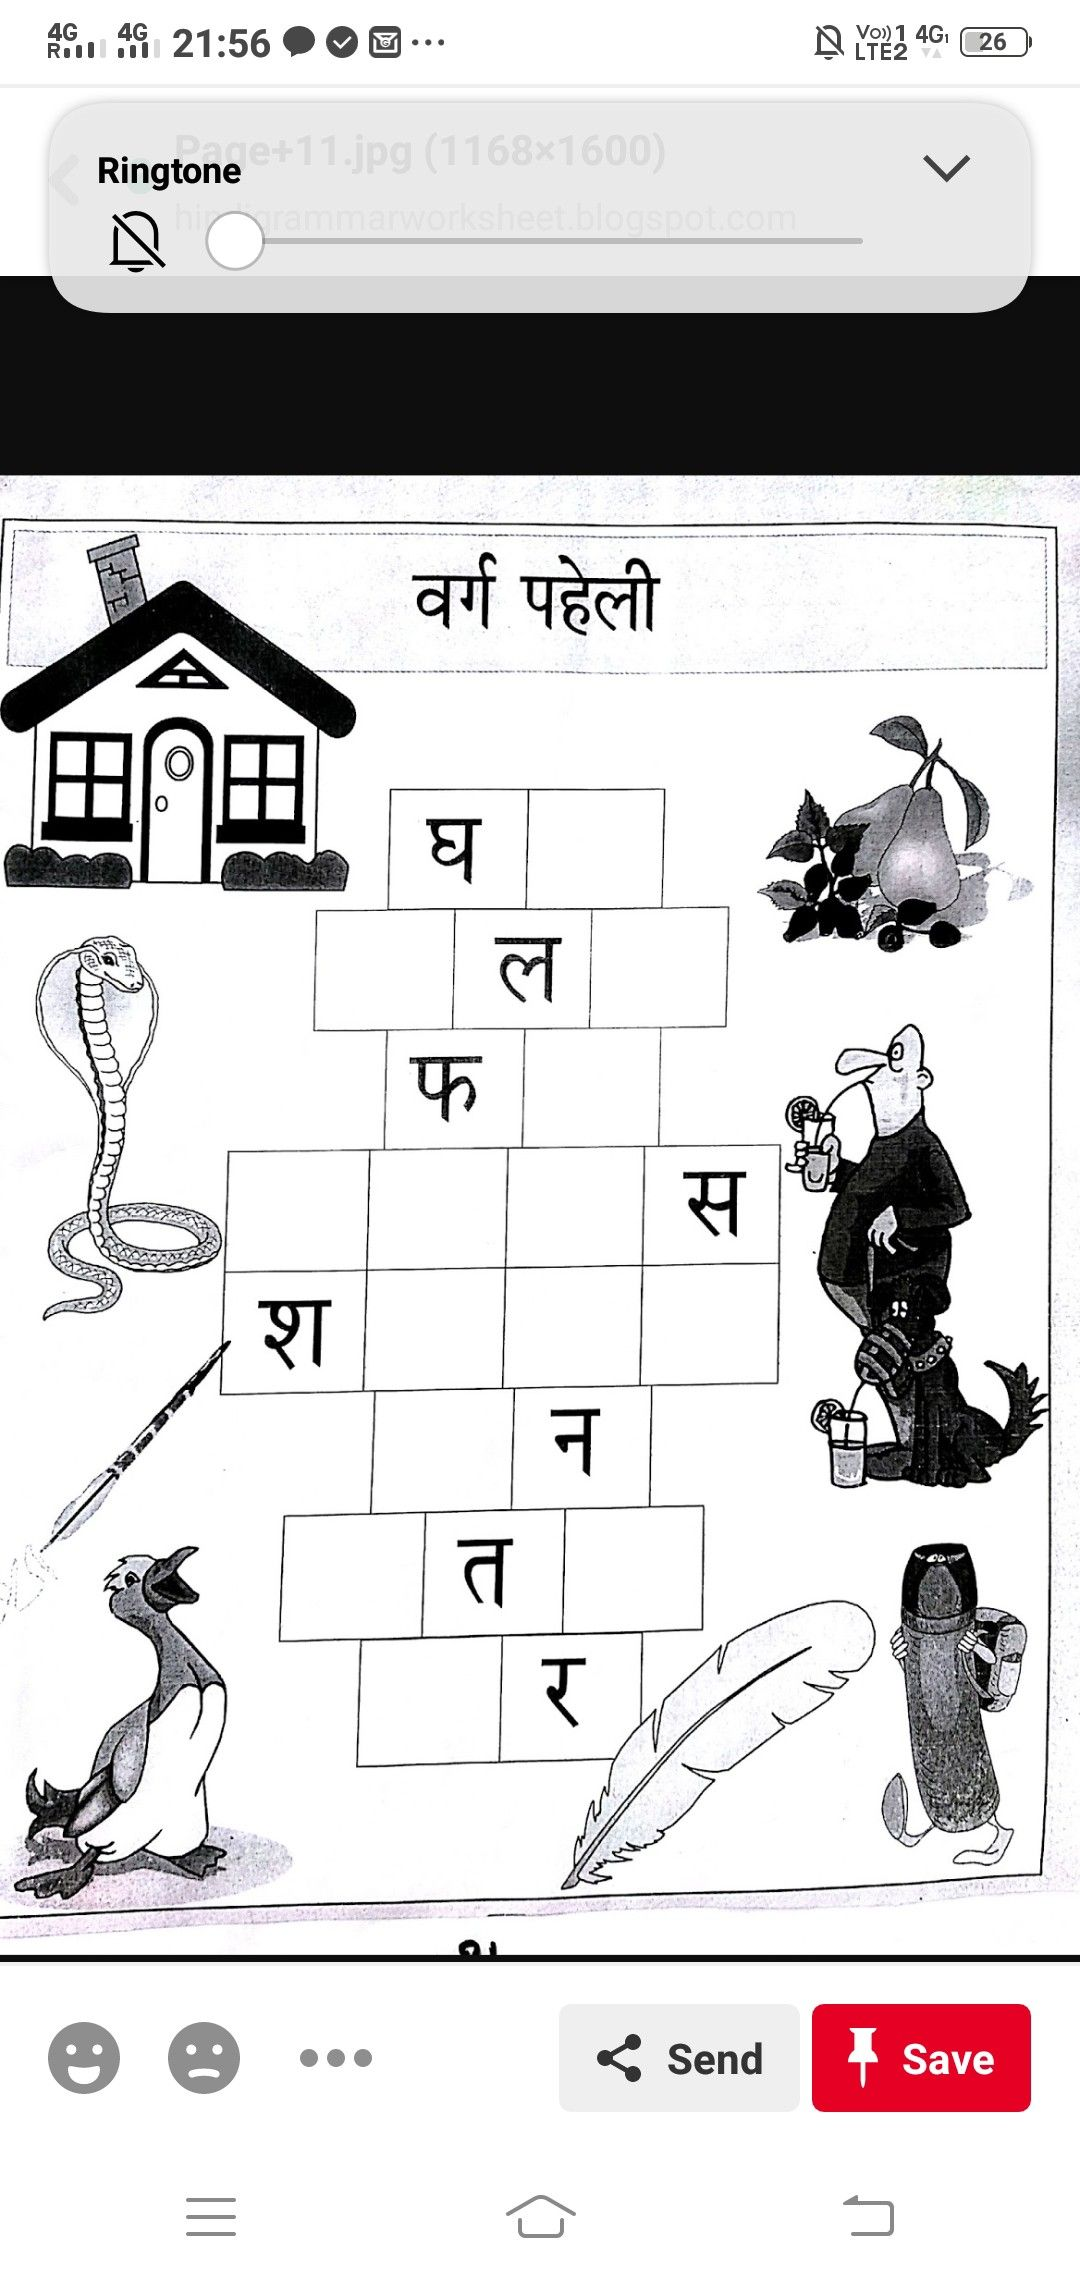 Pin By Vasudha Gaur On Hindi Worksheets Language Worksheets Hindi Worksheets Worksheets [ 2280 x 1080 Pixel ]